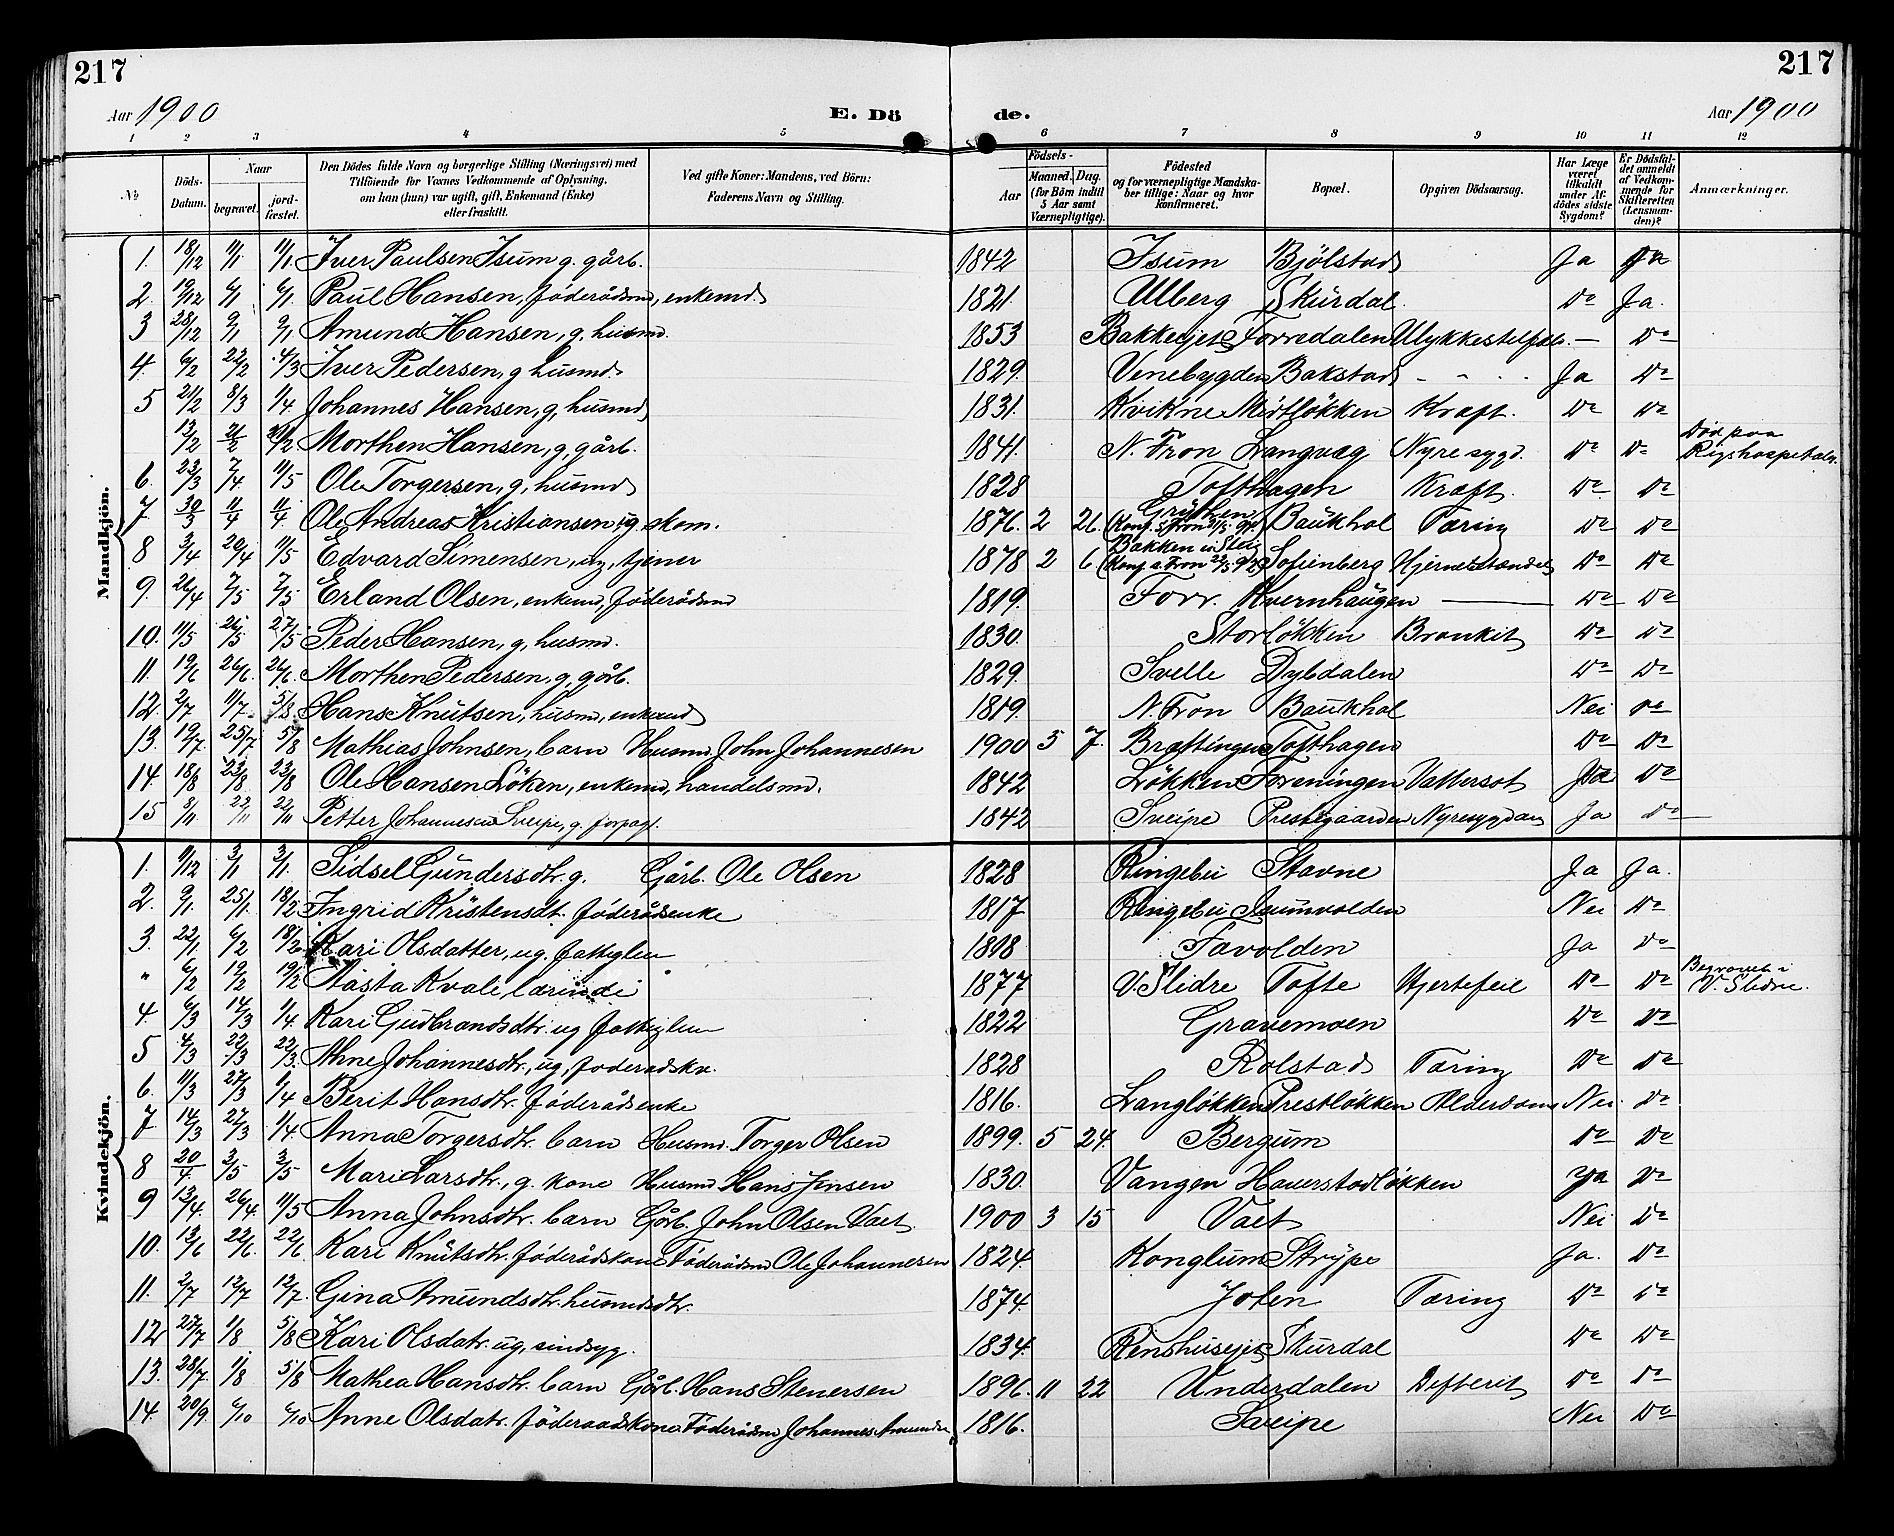 SAH, Sør-Fron prestekontor, H/Ha/Hab/L0004: Klokkerbok nr. 4, 1896-1911, s. 217